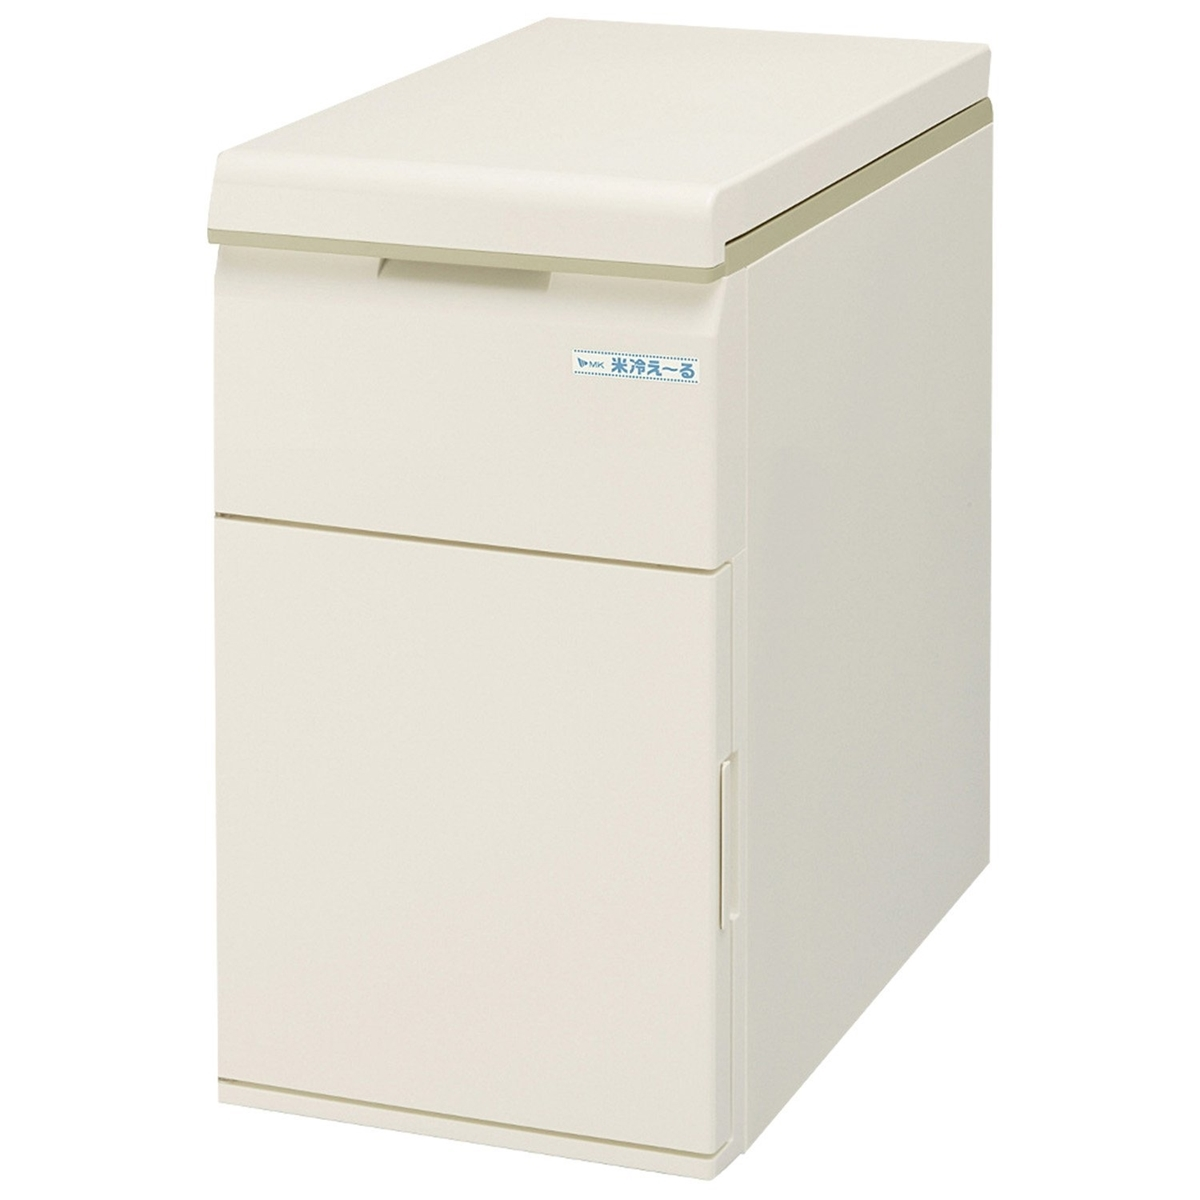 MK精工 保冷米びつ 米冷えーる 米容量 11kg ホワイト NCK-11W